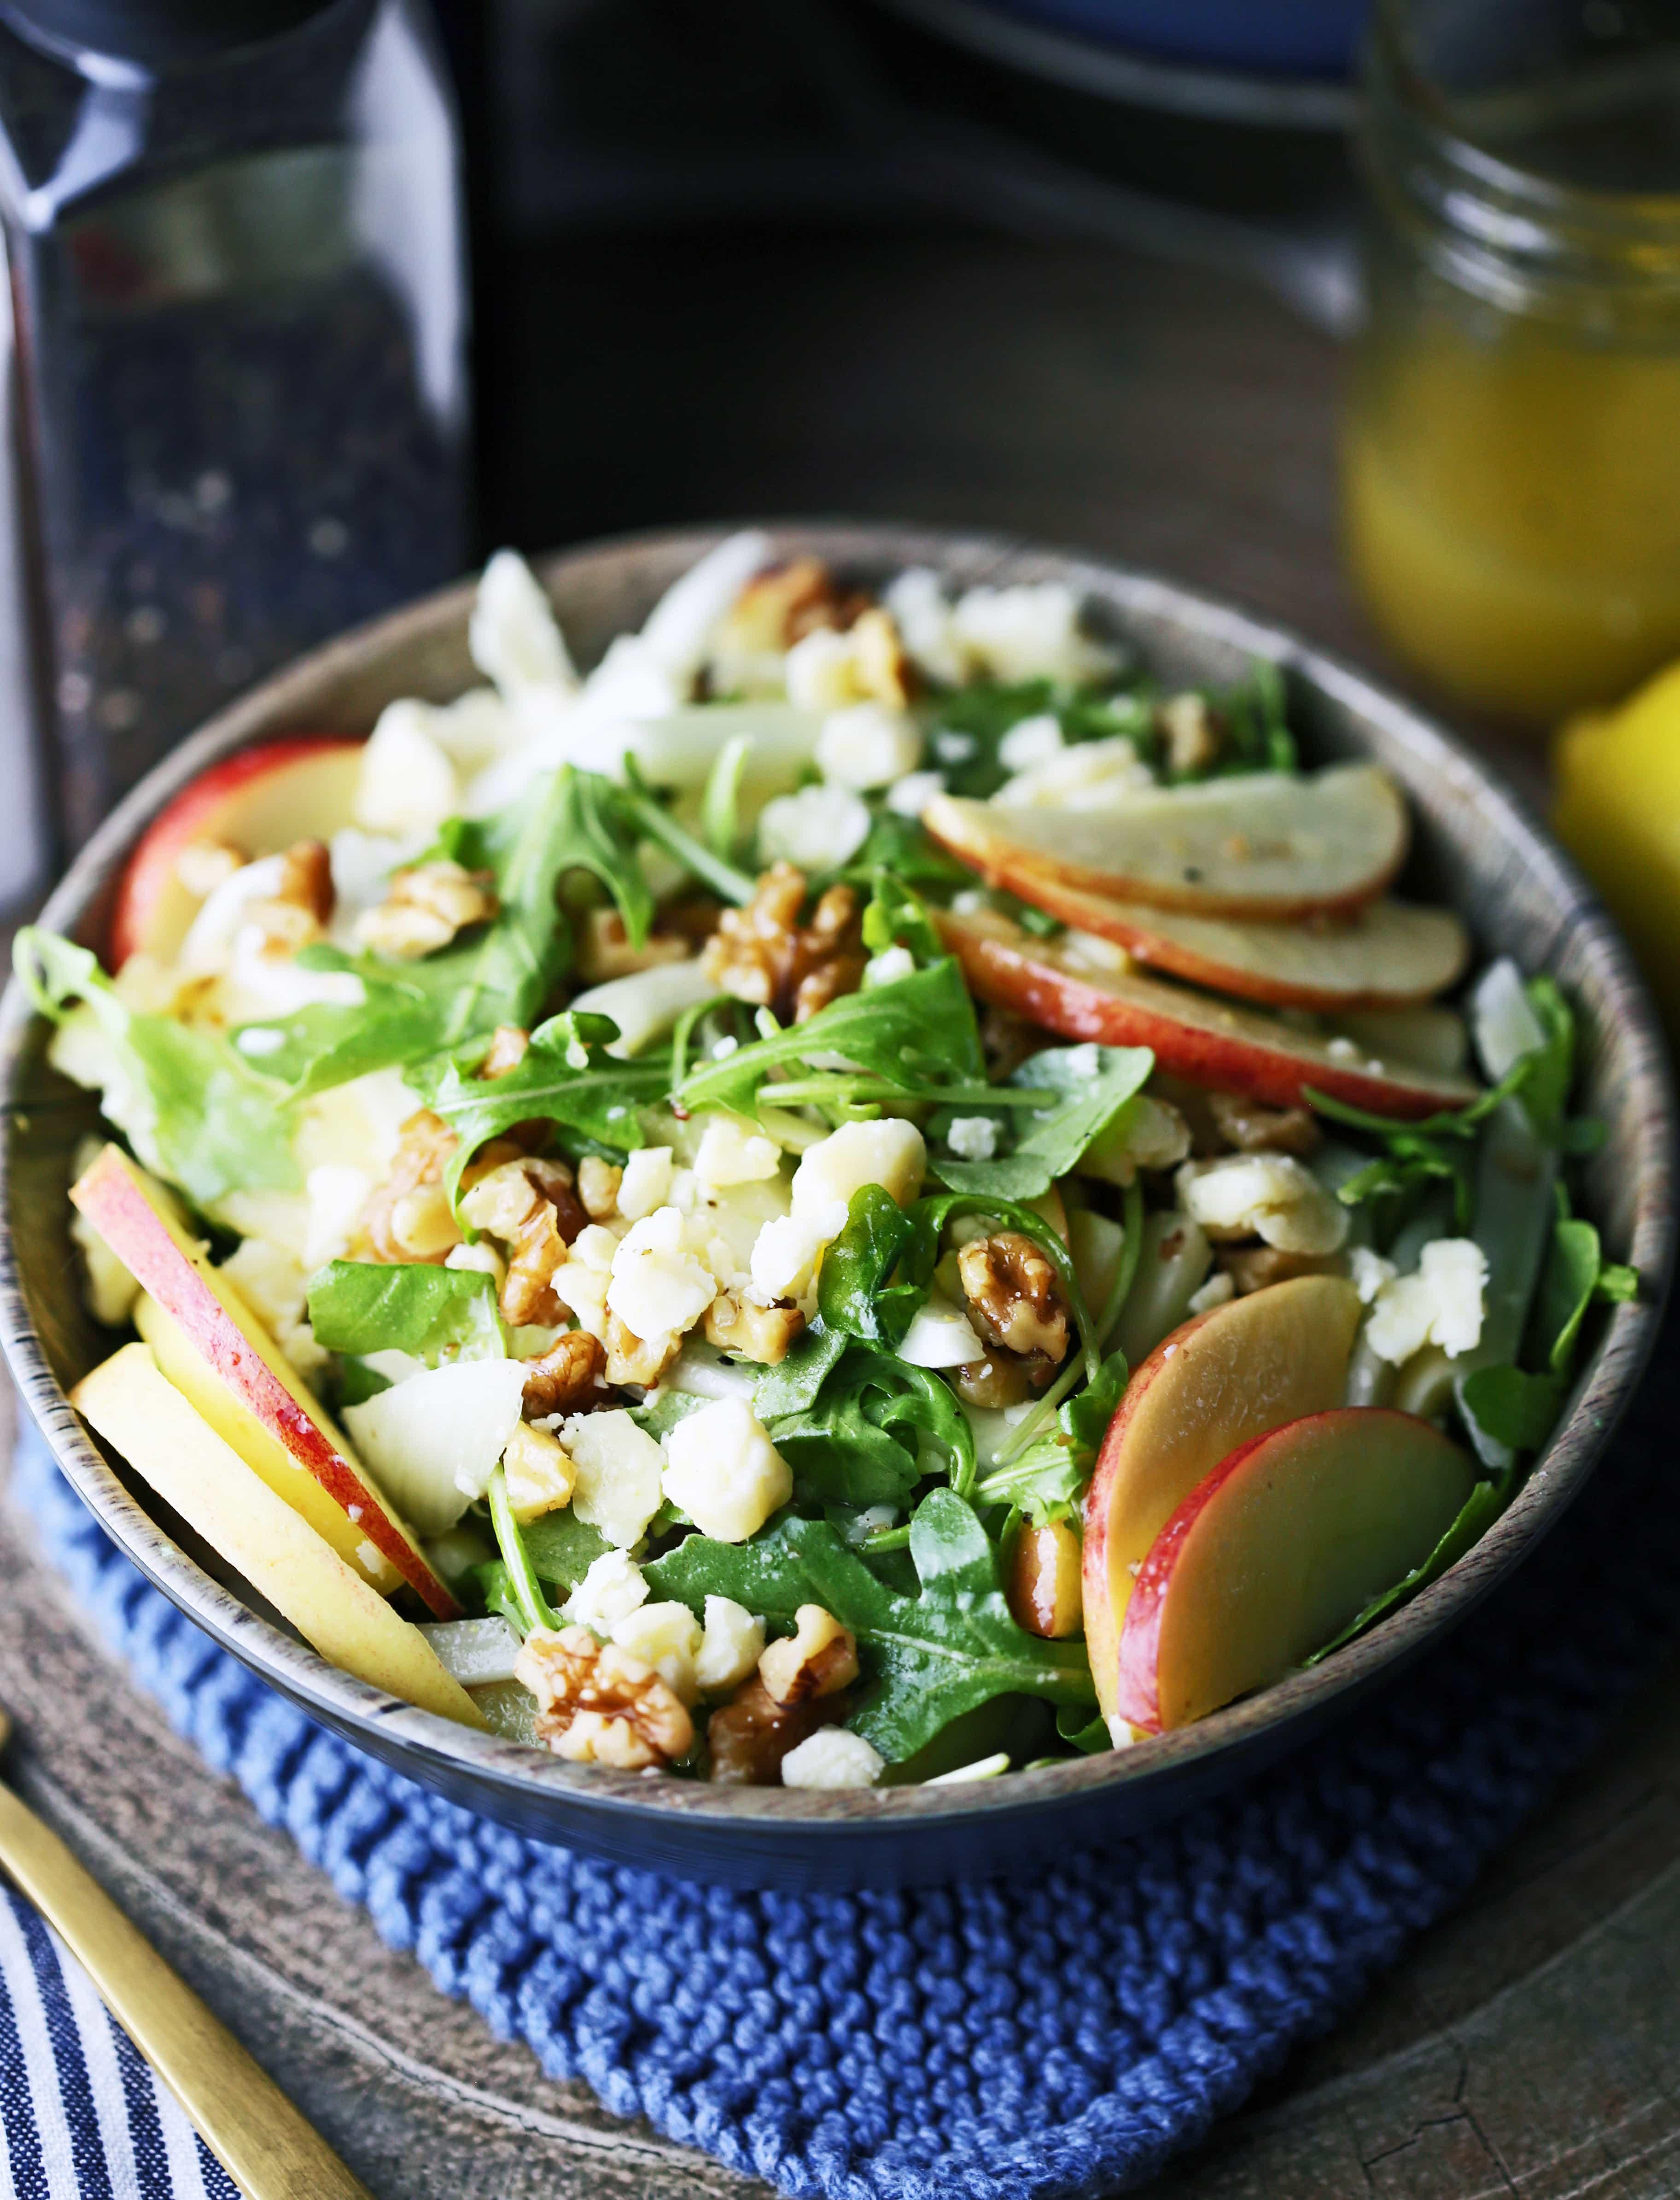 Apple fennel arugula salad with honey lemon dressing in a brown bowl.